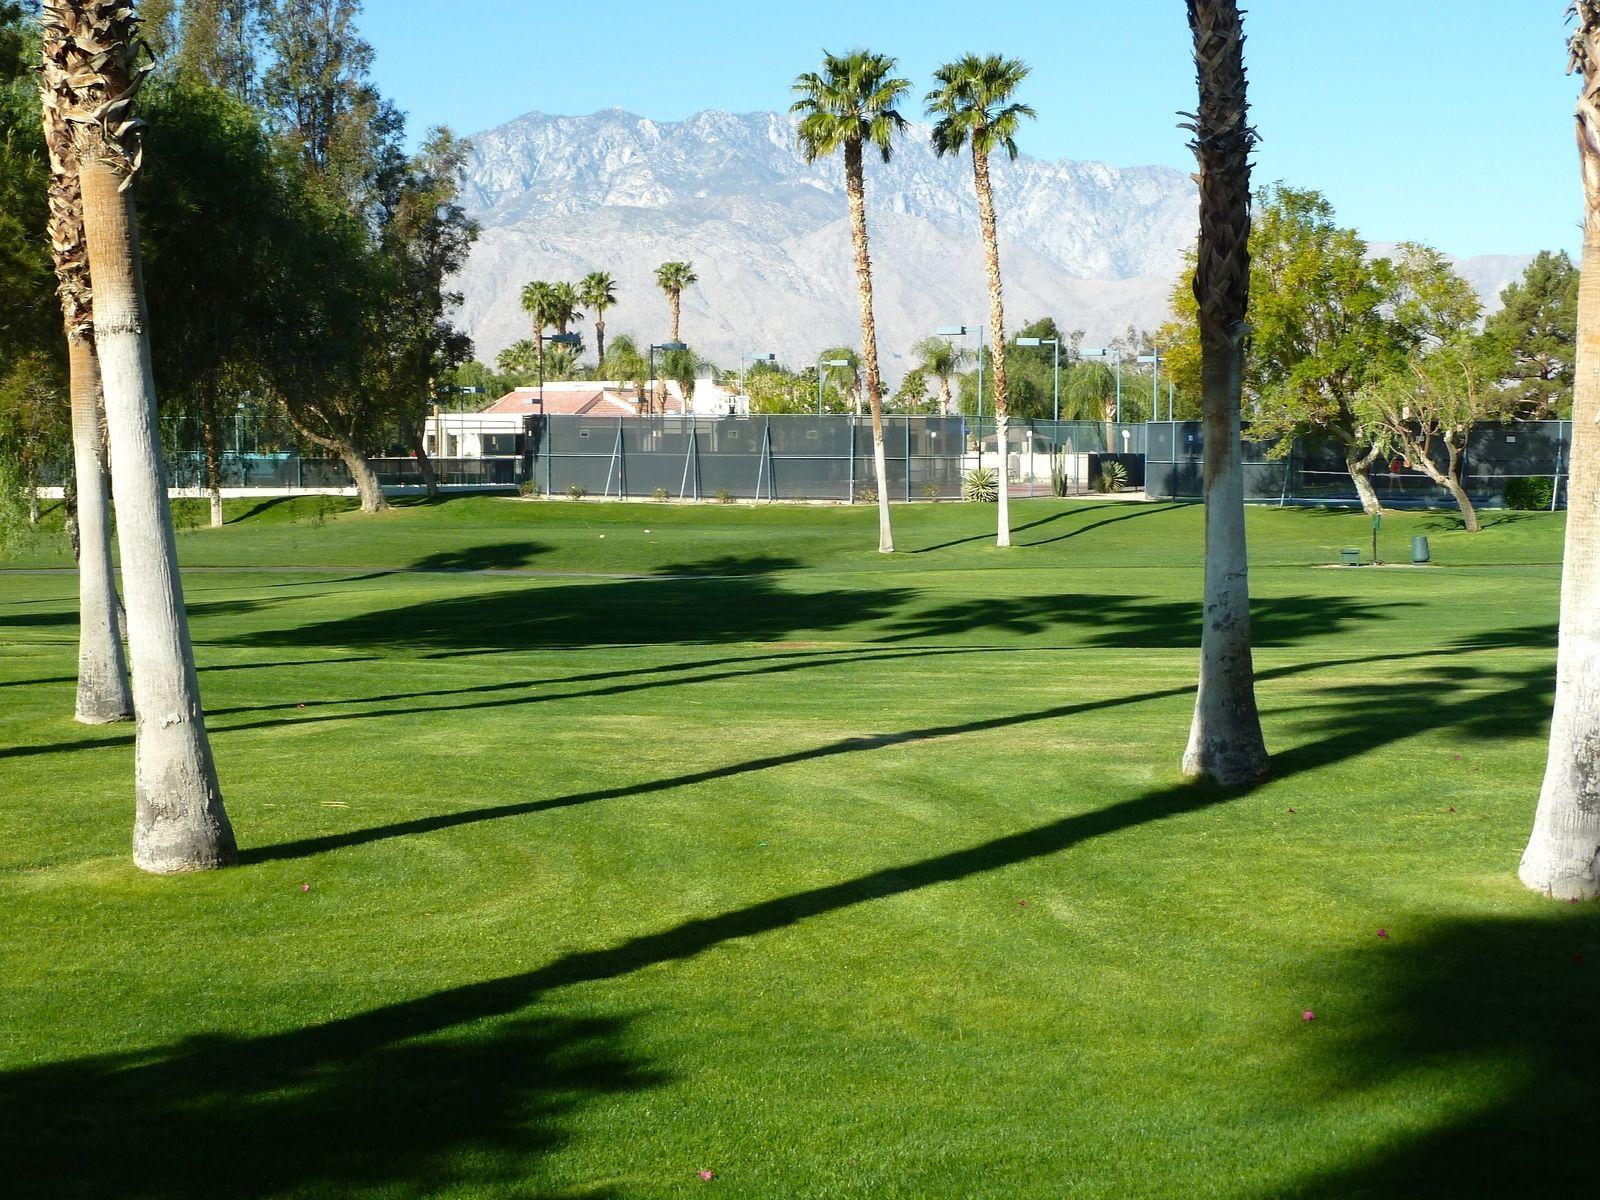 tennis-tourist-desert-princess-resort-fairway-and-tennis-courts-teri-church